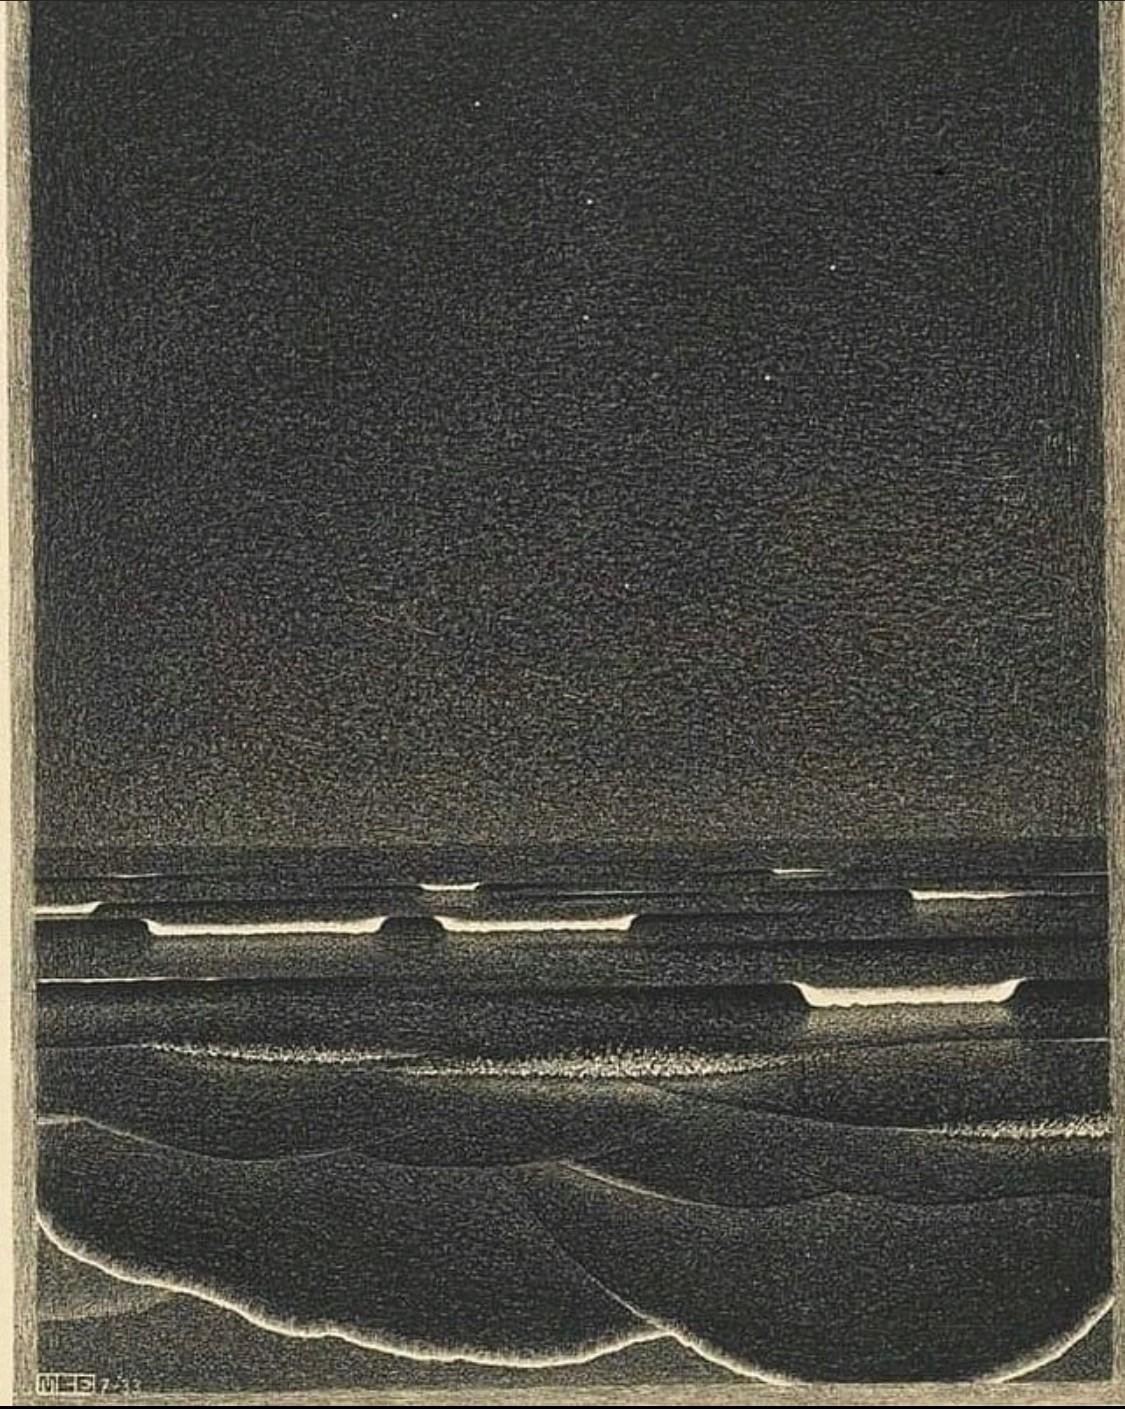 MC Escher, Phosphorescent Sea